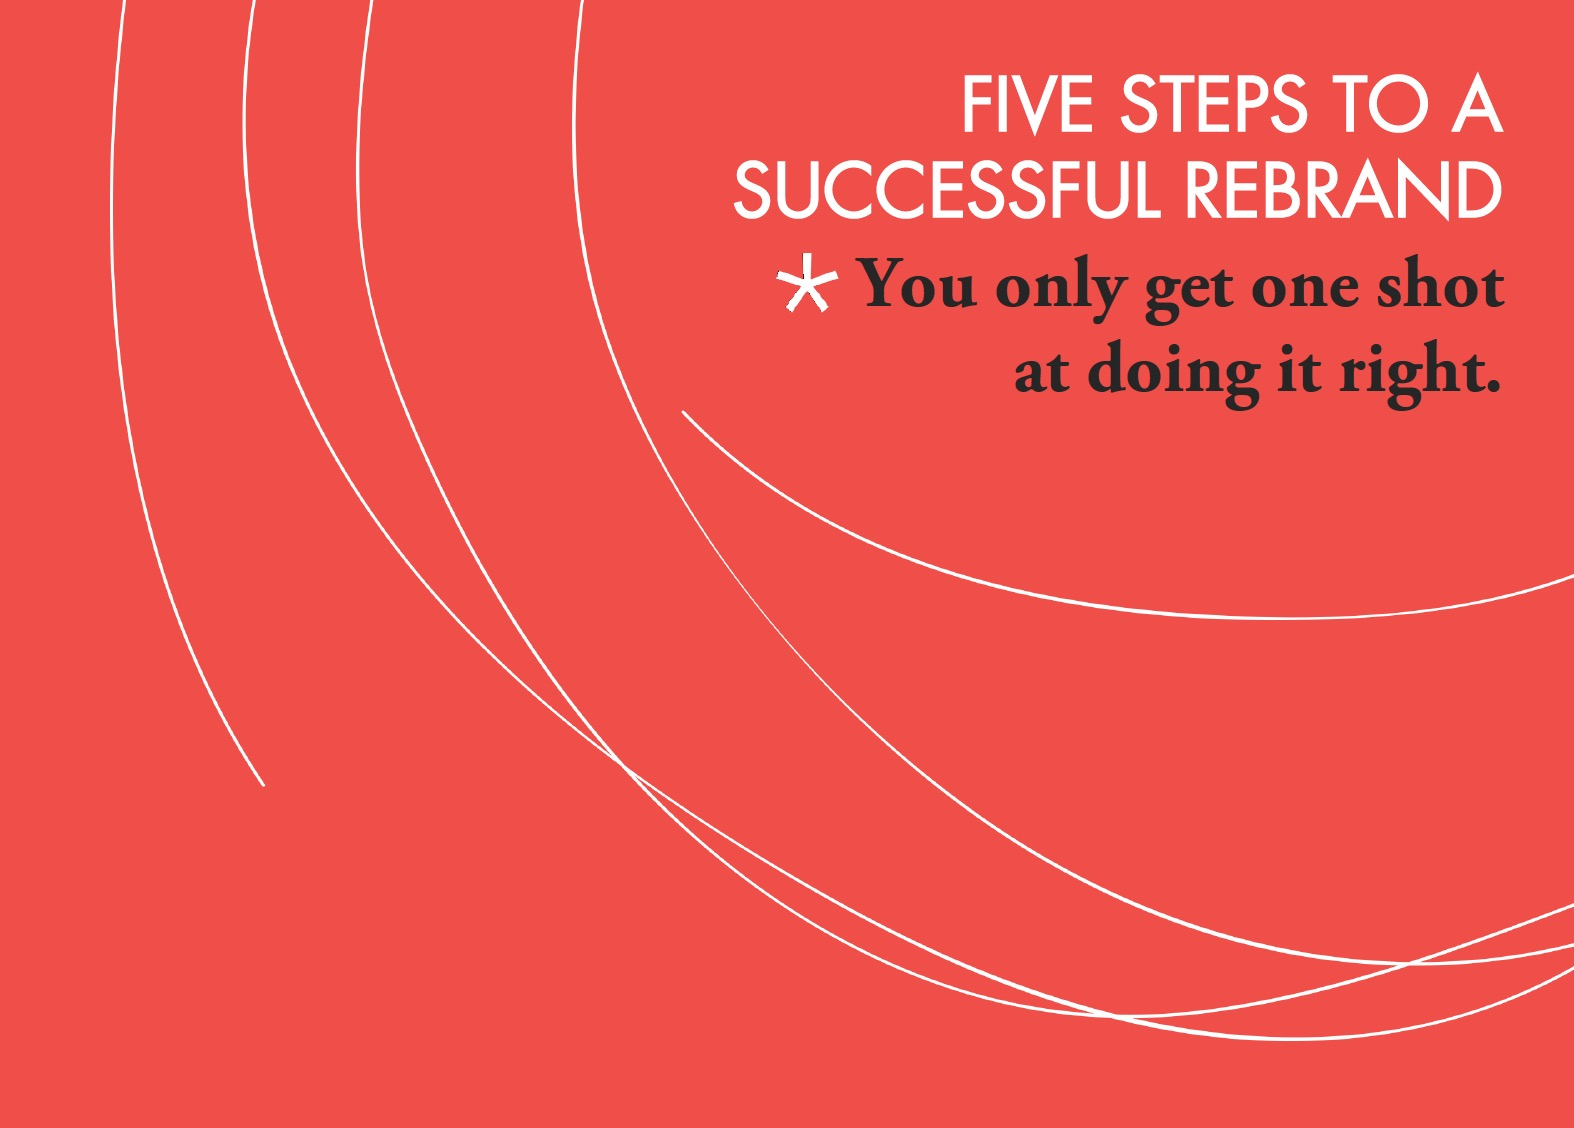 5 Steps to a Successful Rebrand